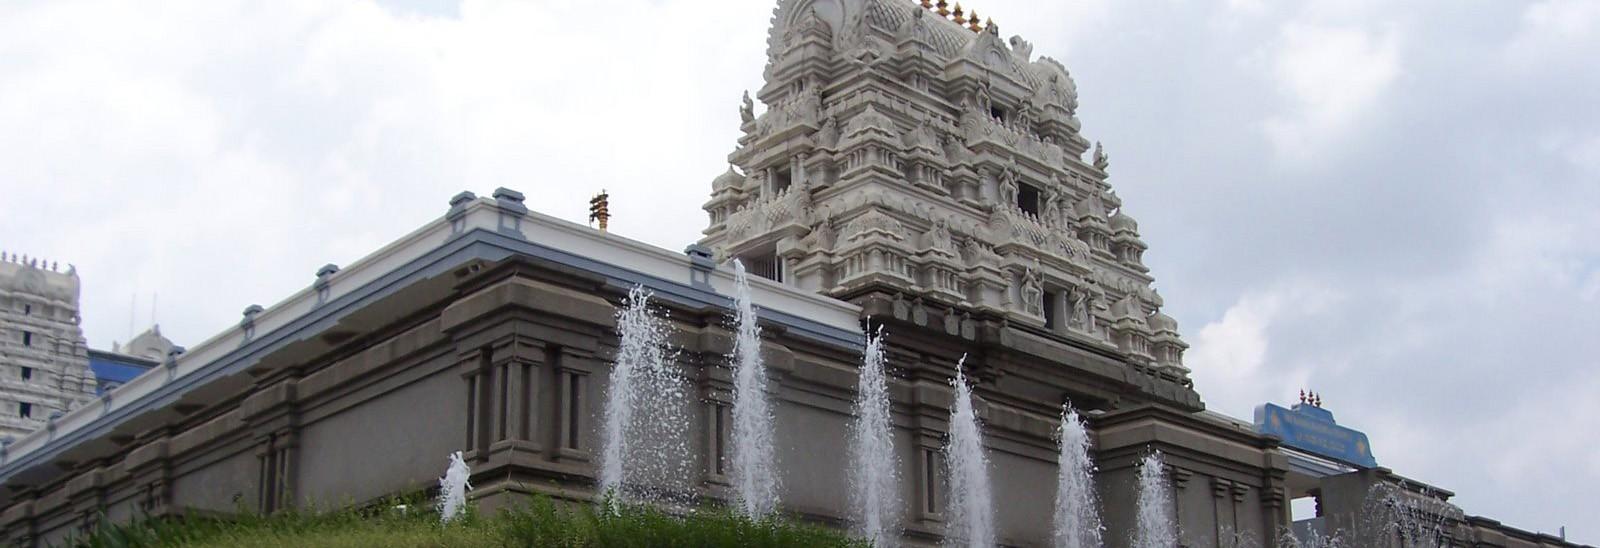 ISKCON Temple Bangalore - Sri Radha Krishna Temple - Biggest ISKCON Temples In The world